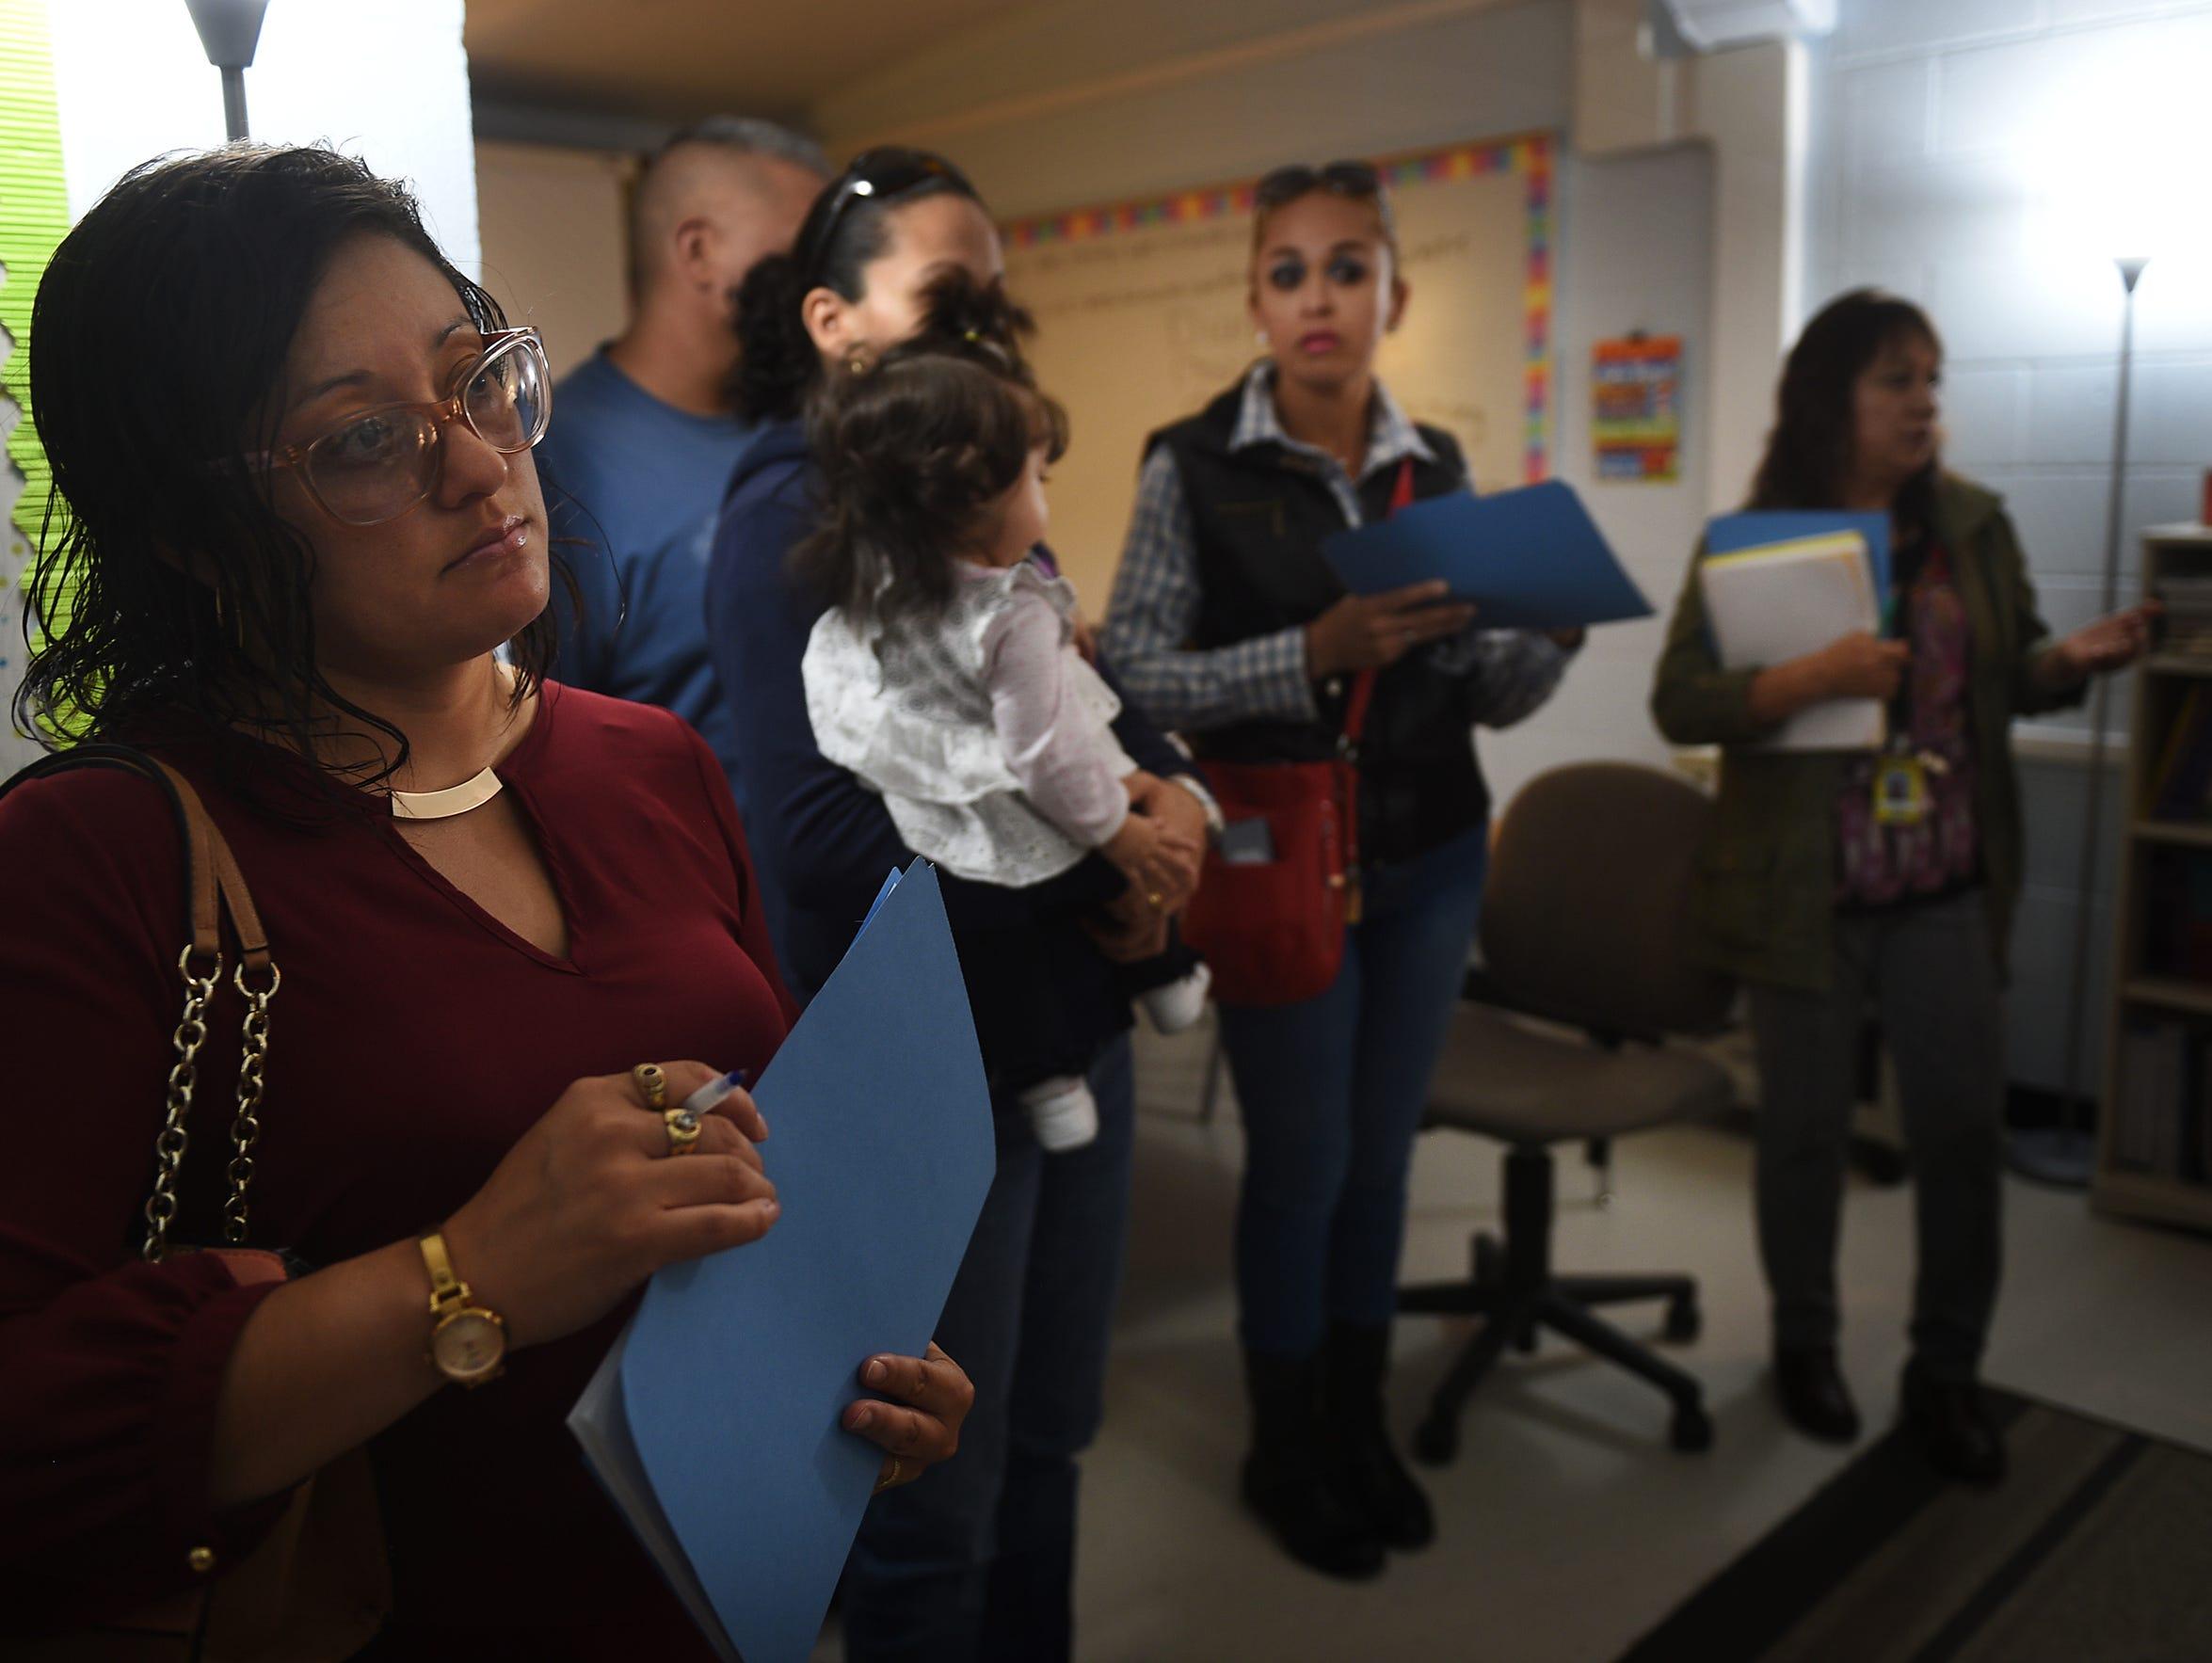 Concerned parent Lidia Rangel, left, listens with others